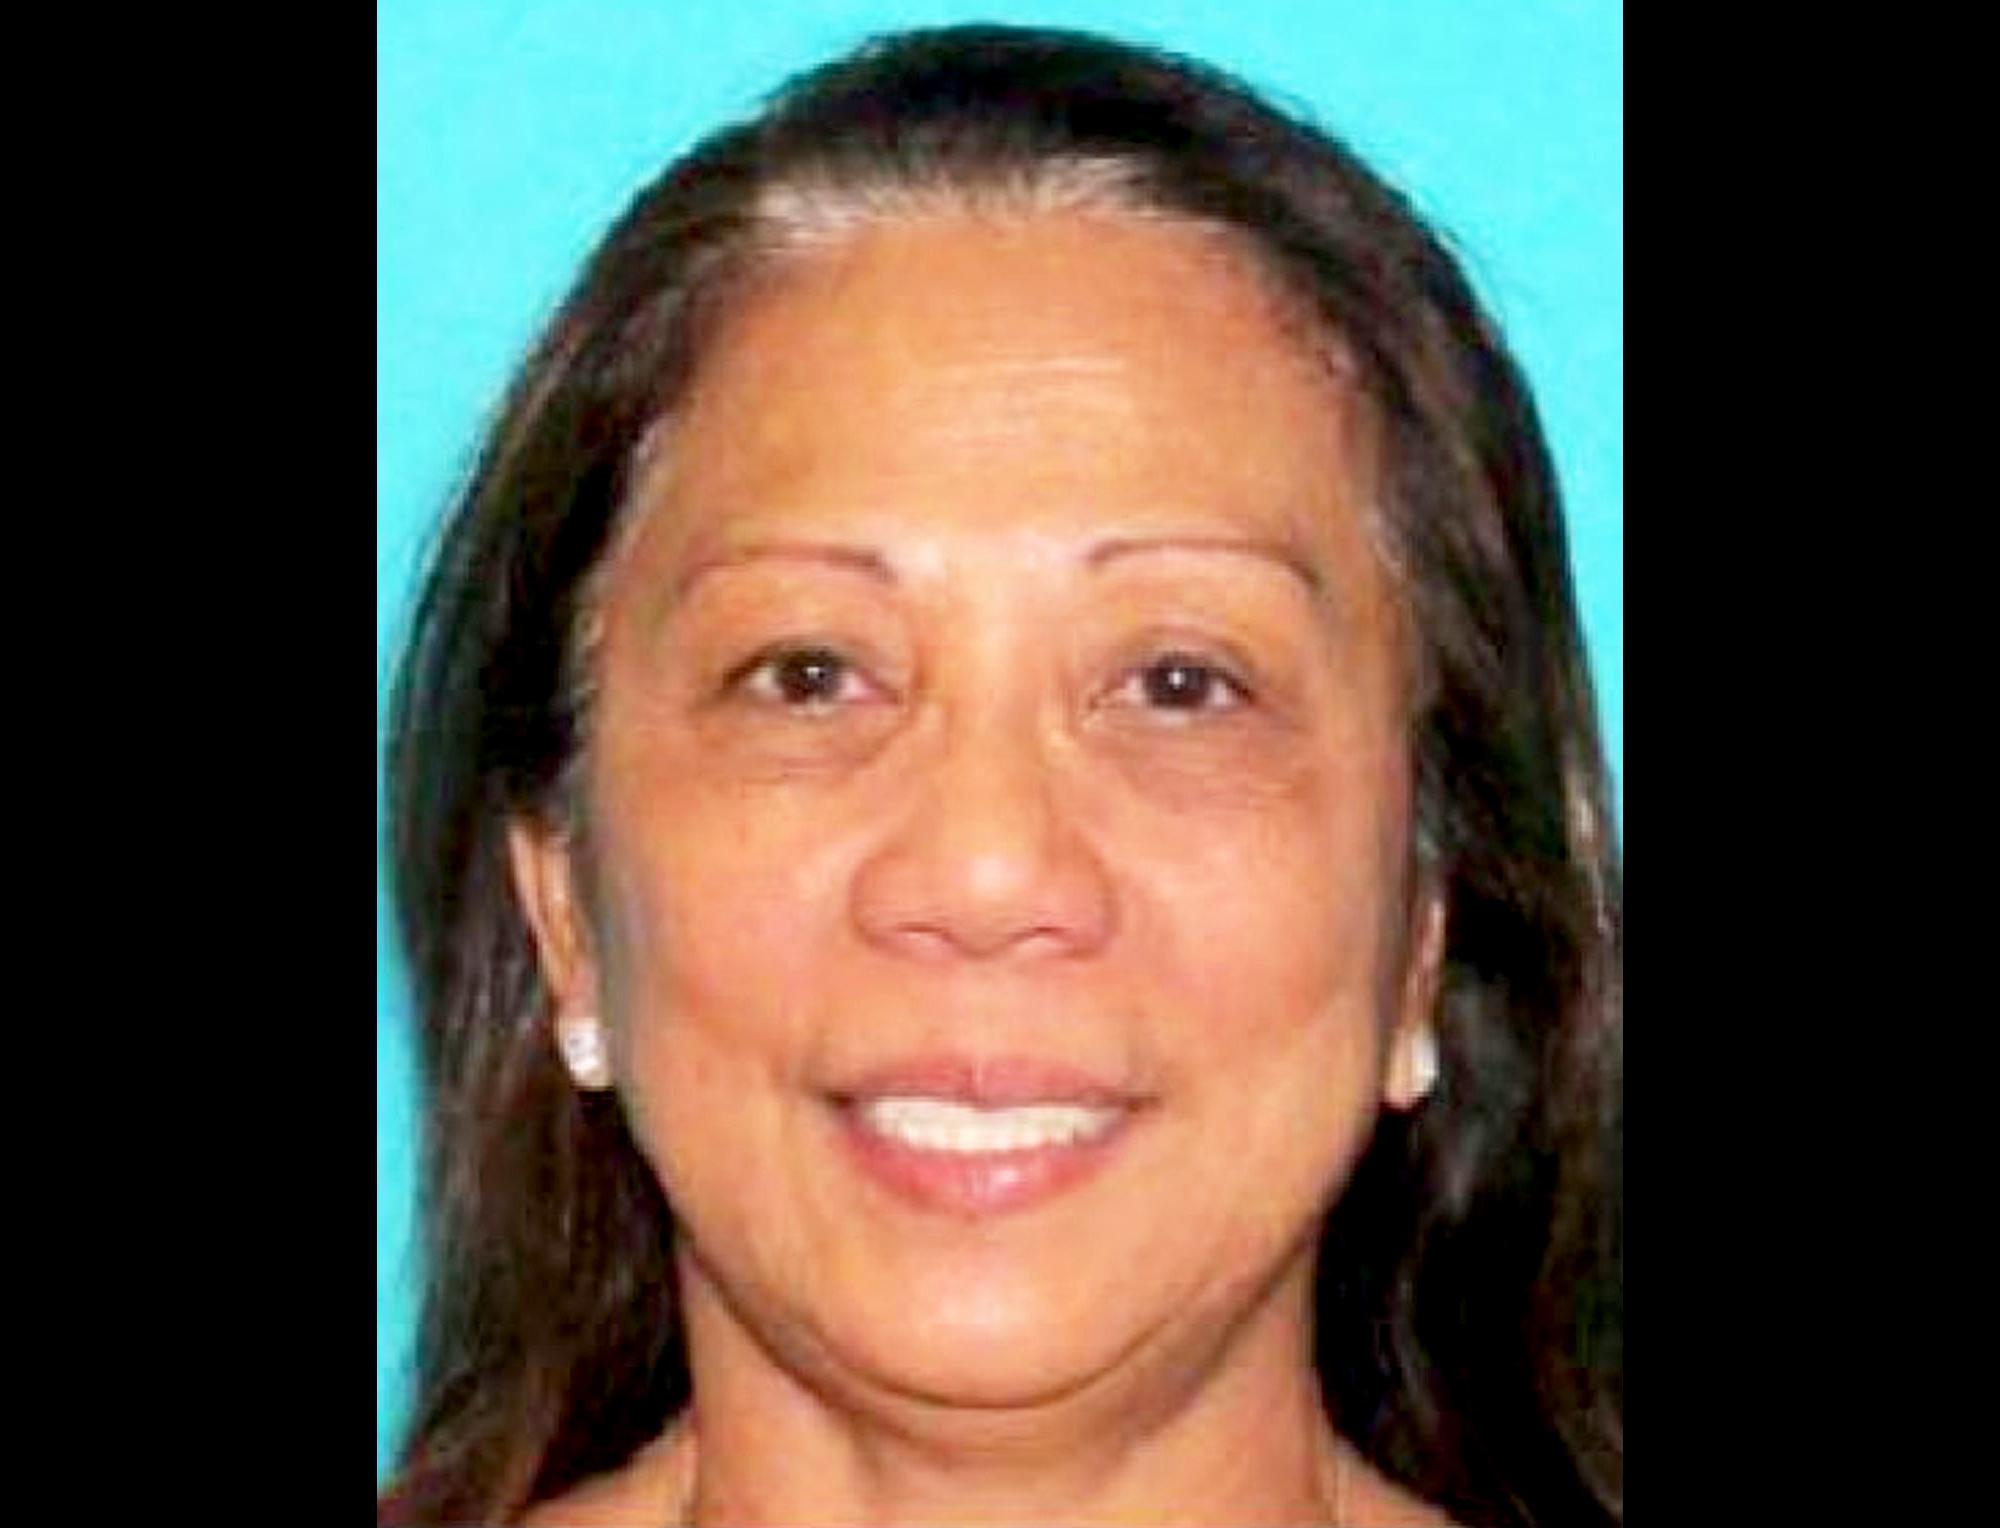 Las Vegas shooter Marilou Danley